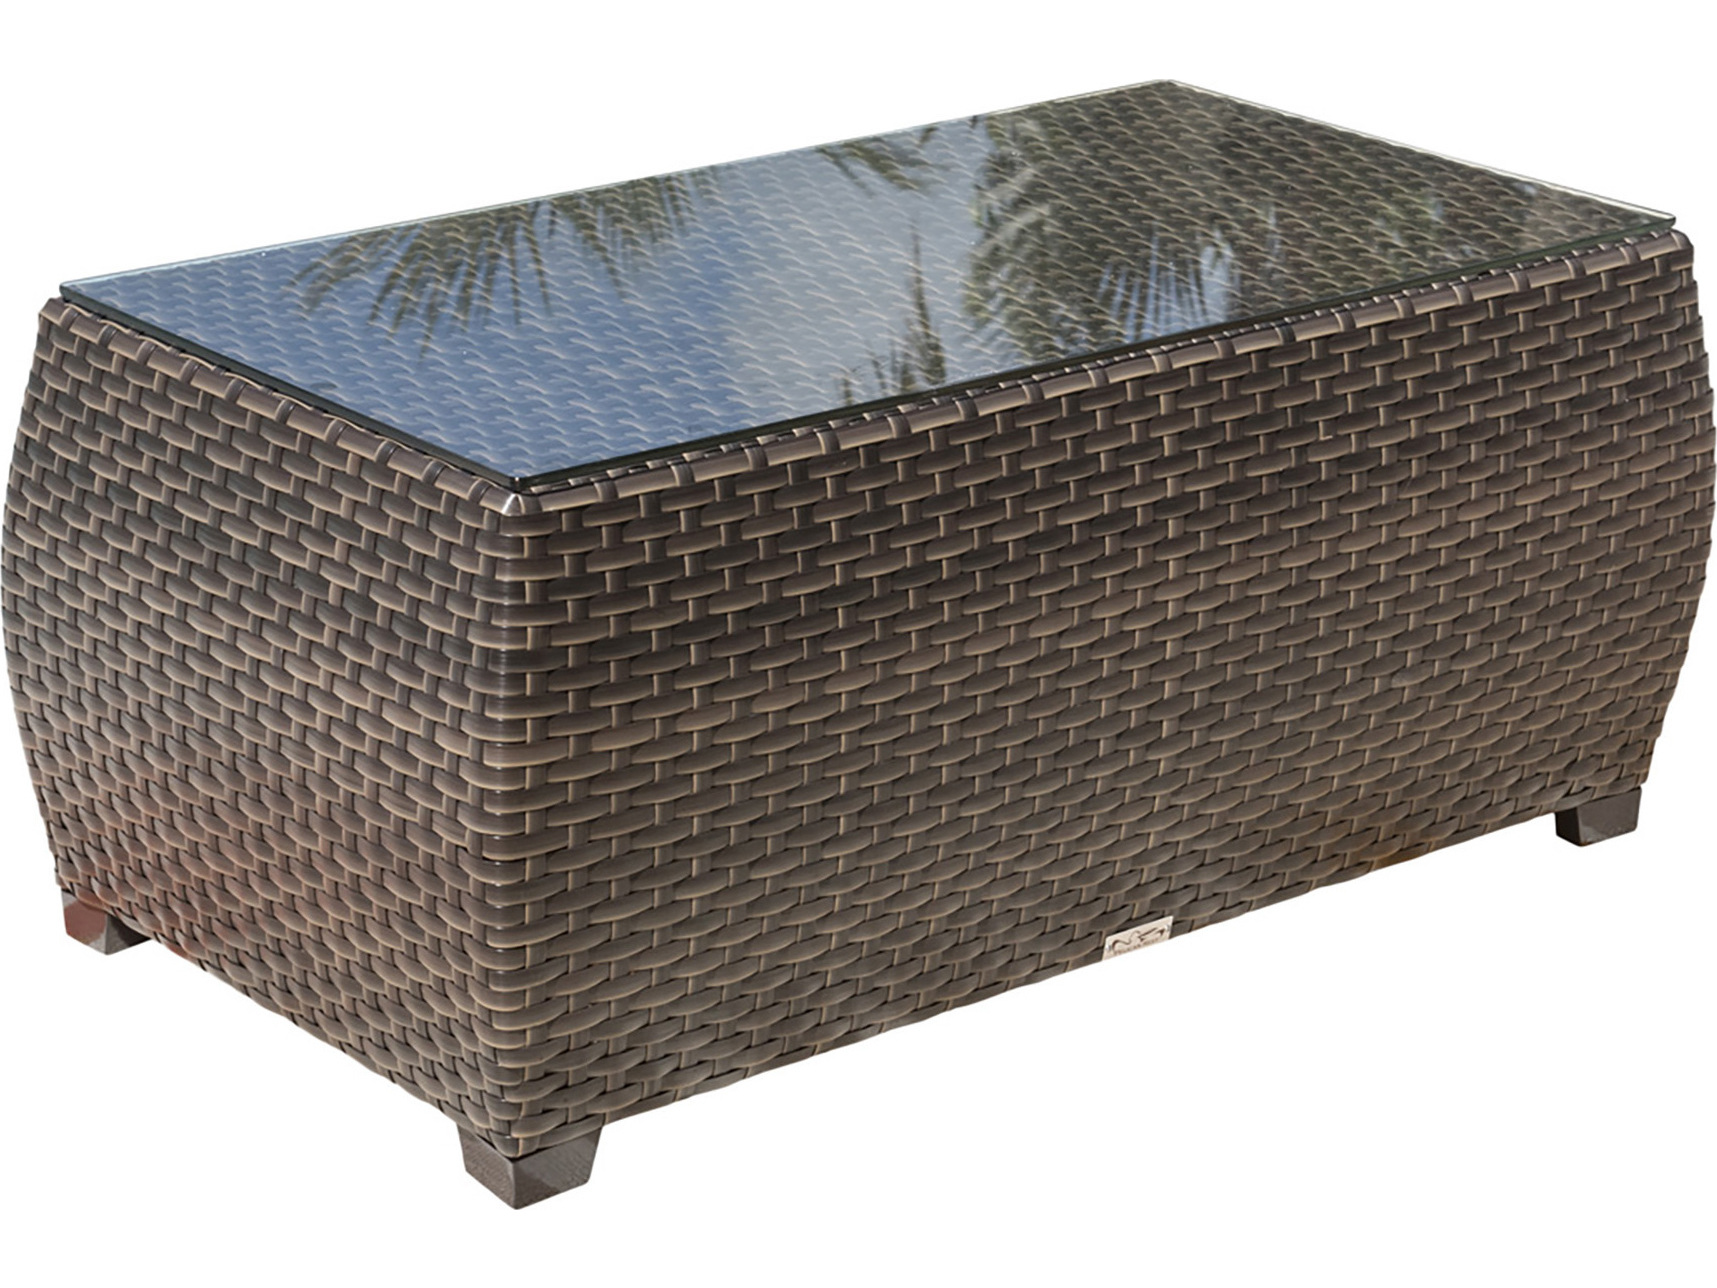 Hospitality Rattan Outdoor Fiji 46 Wide Wicker Rectangular Coffee Table